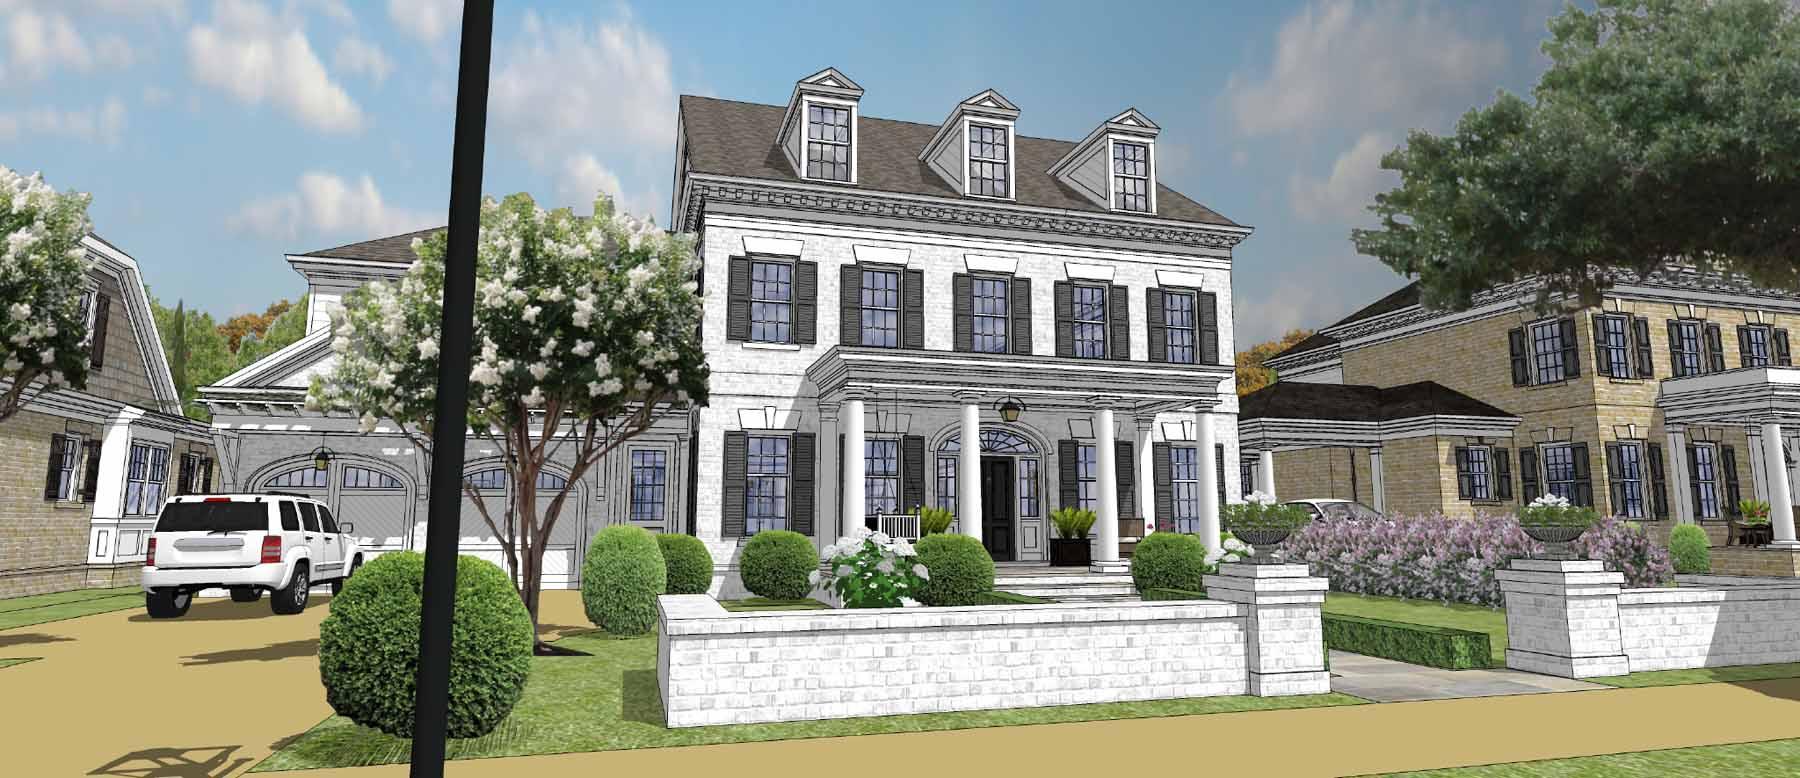 Nhà ở một gia đình vì Bán tại Premier Custom Built Gated Neighborhood in Downtown Alpharetta 2125 Canton View Alpharetta, Georgia, 30009 Hoa Kỳ